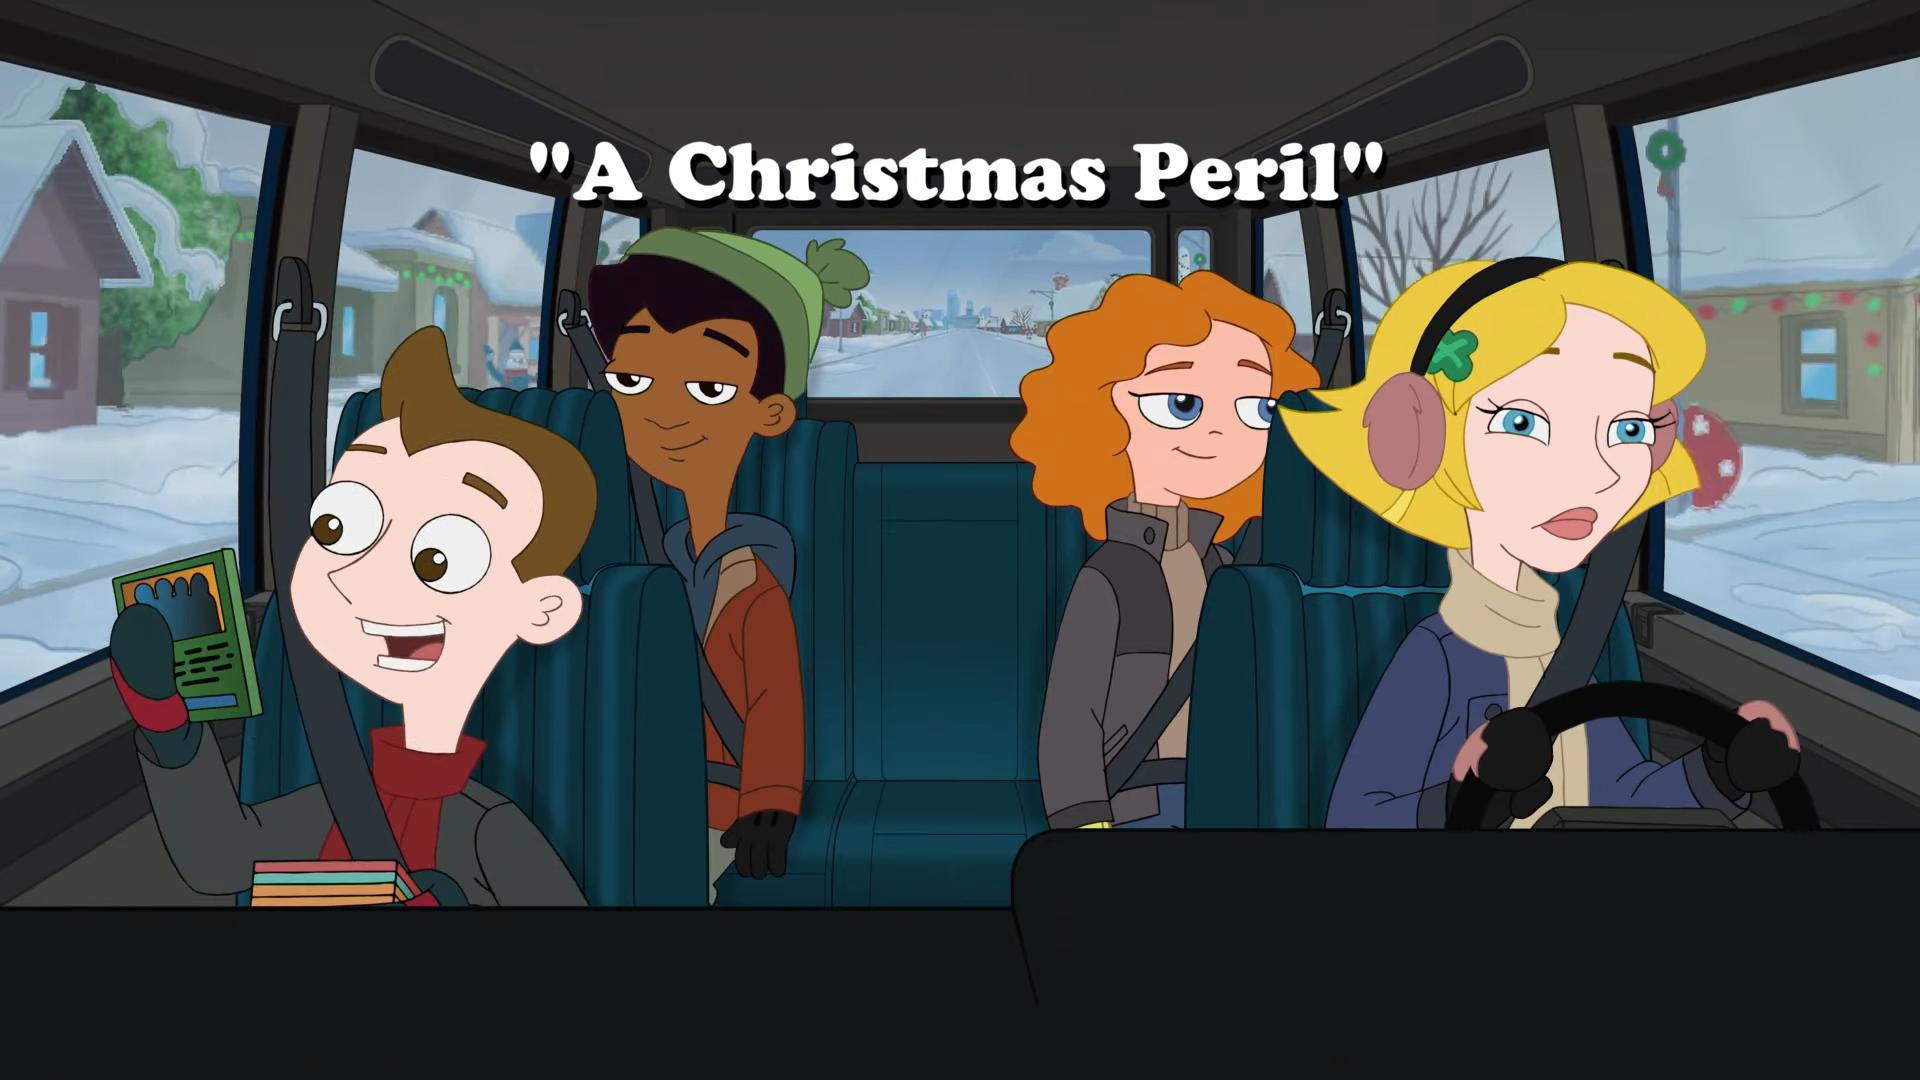 A Christmas Peril (Milo Murphy's Law)